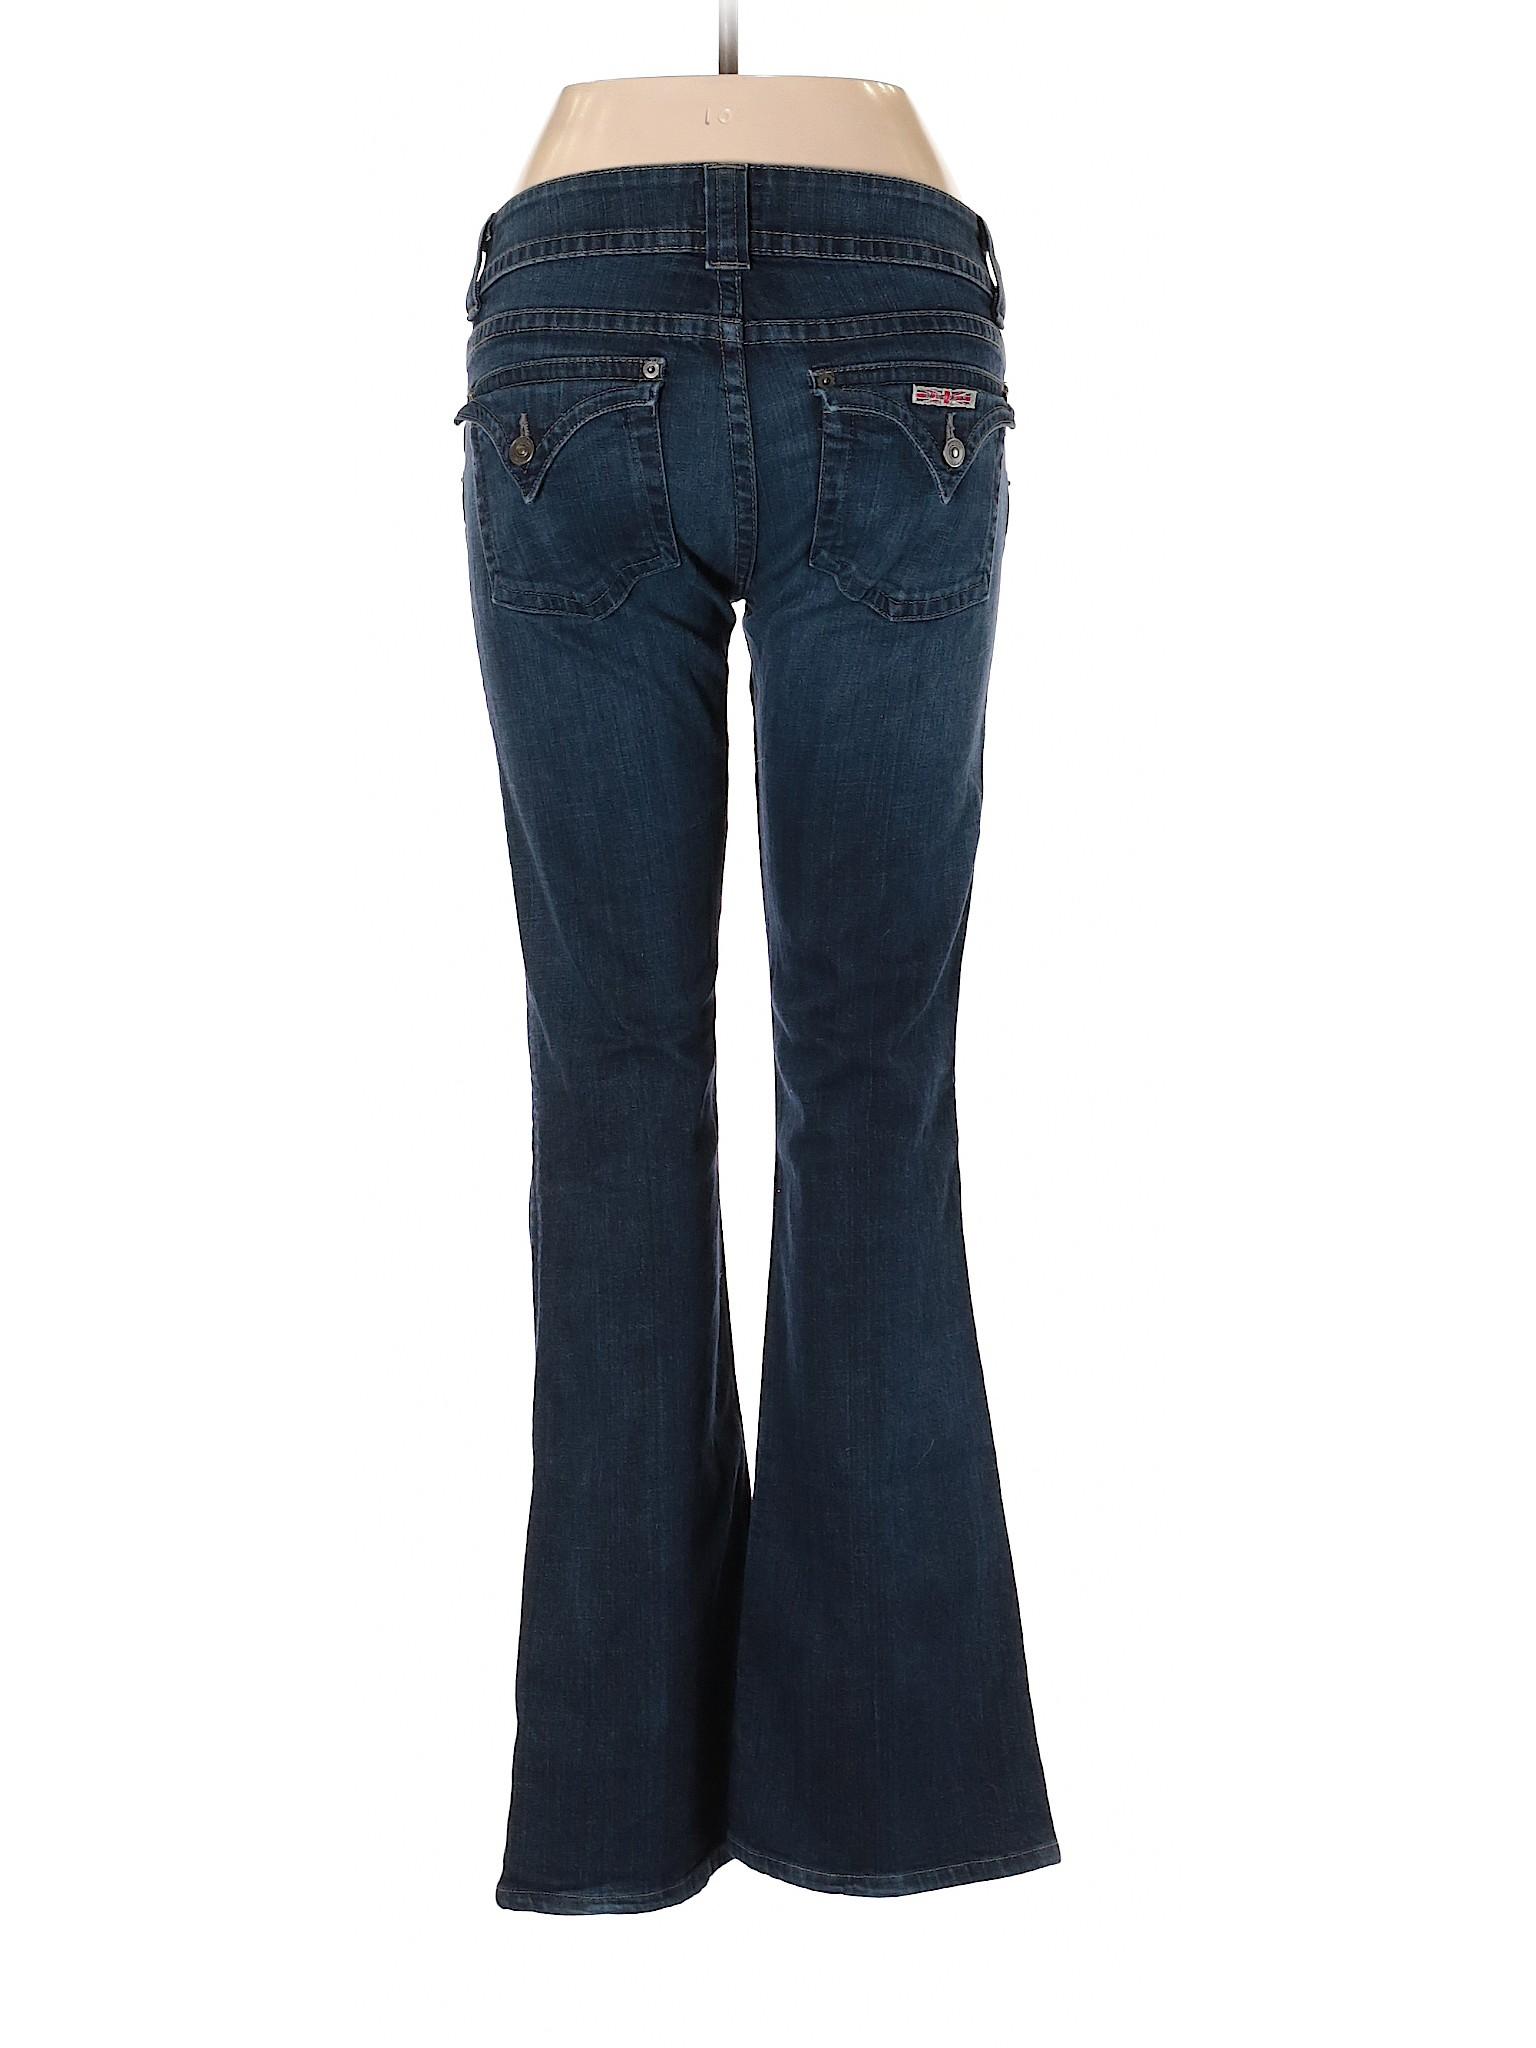 Promotion Jeans Promotion Hudson Hudson Hudson Jeans Hudson Hudson Jeans Jeans Promotion Jeans Promotion Jeans Hudson Promotion Promotion vqzfEgw0